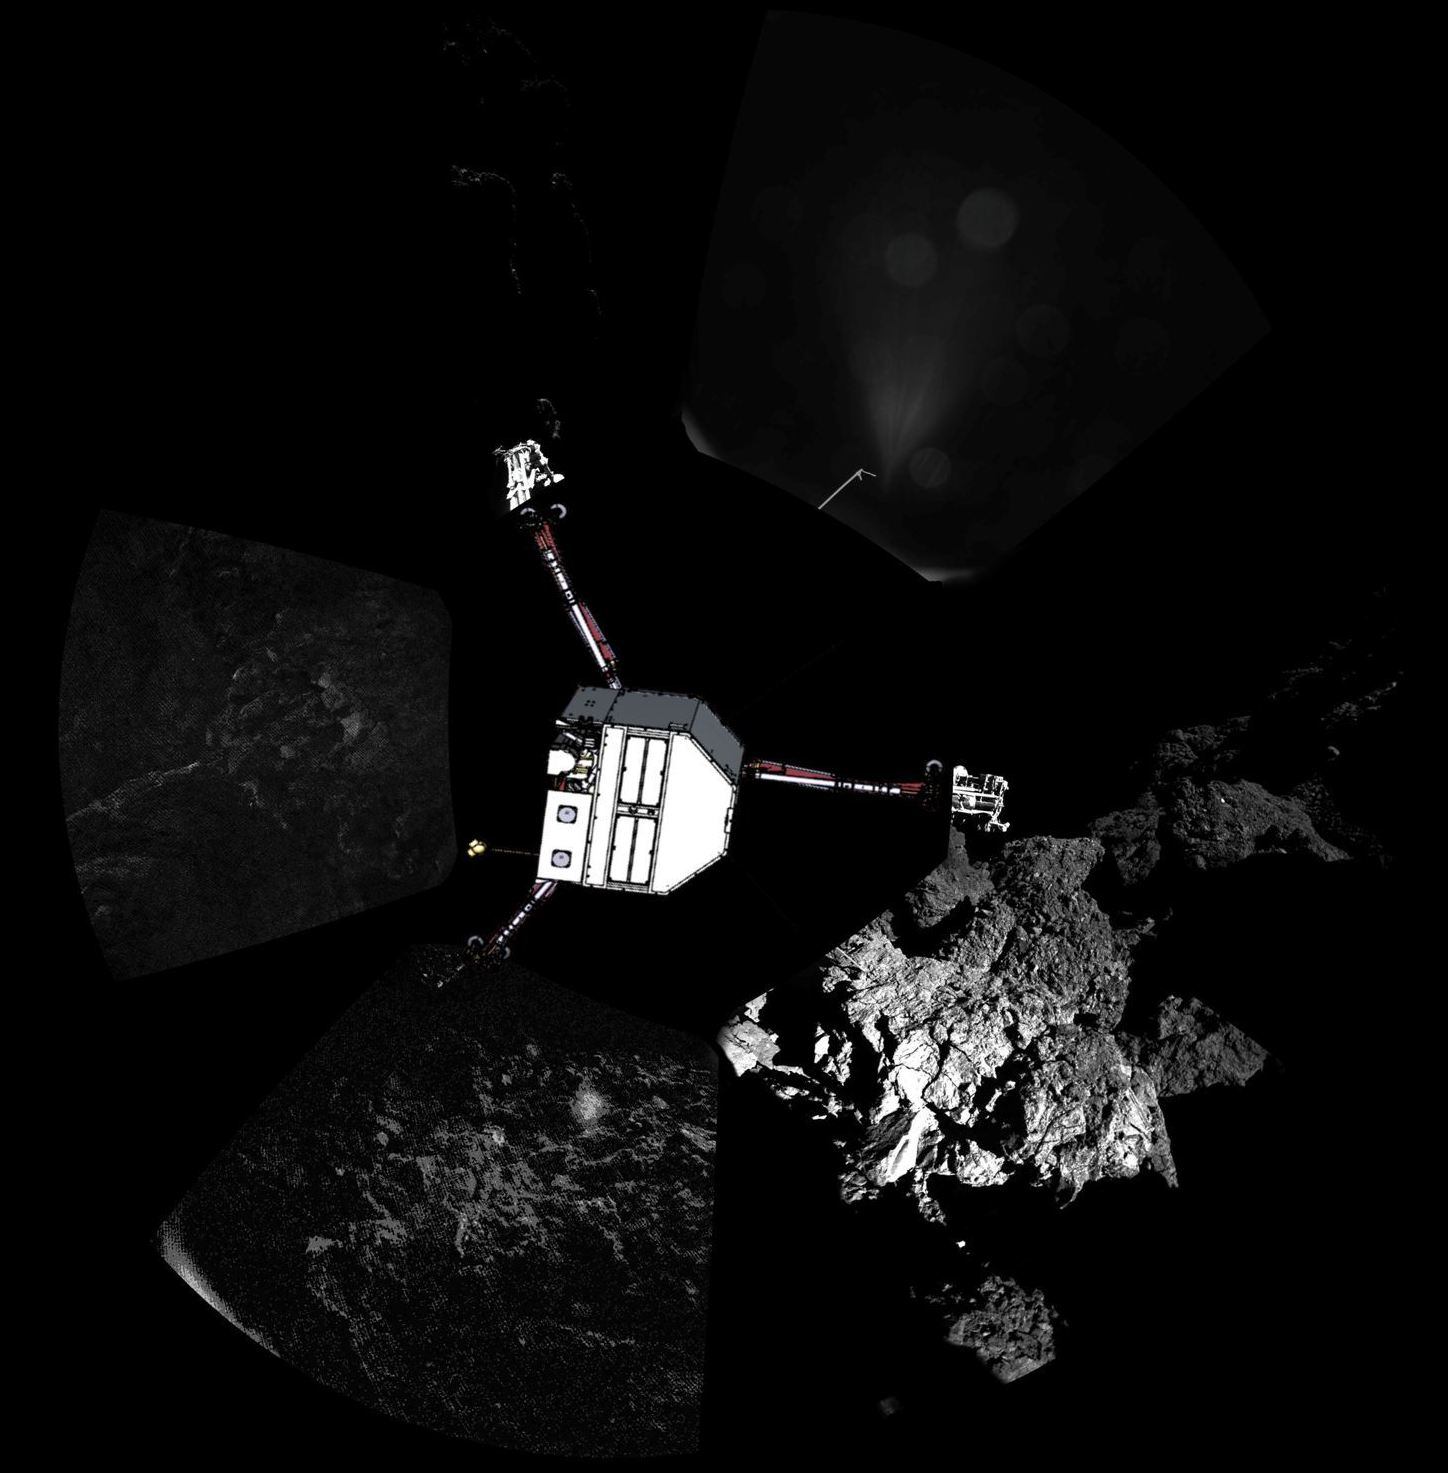 comet-pano-orientation